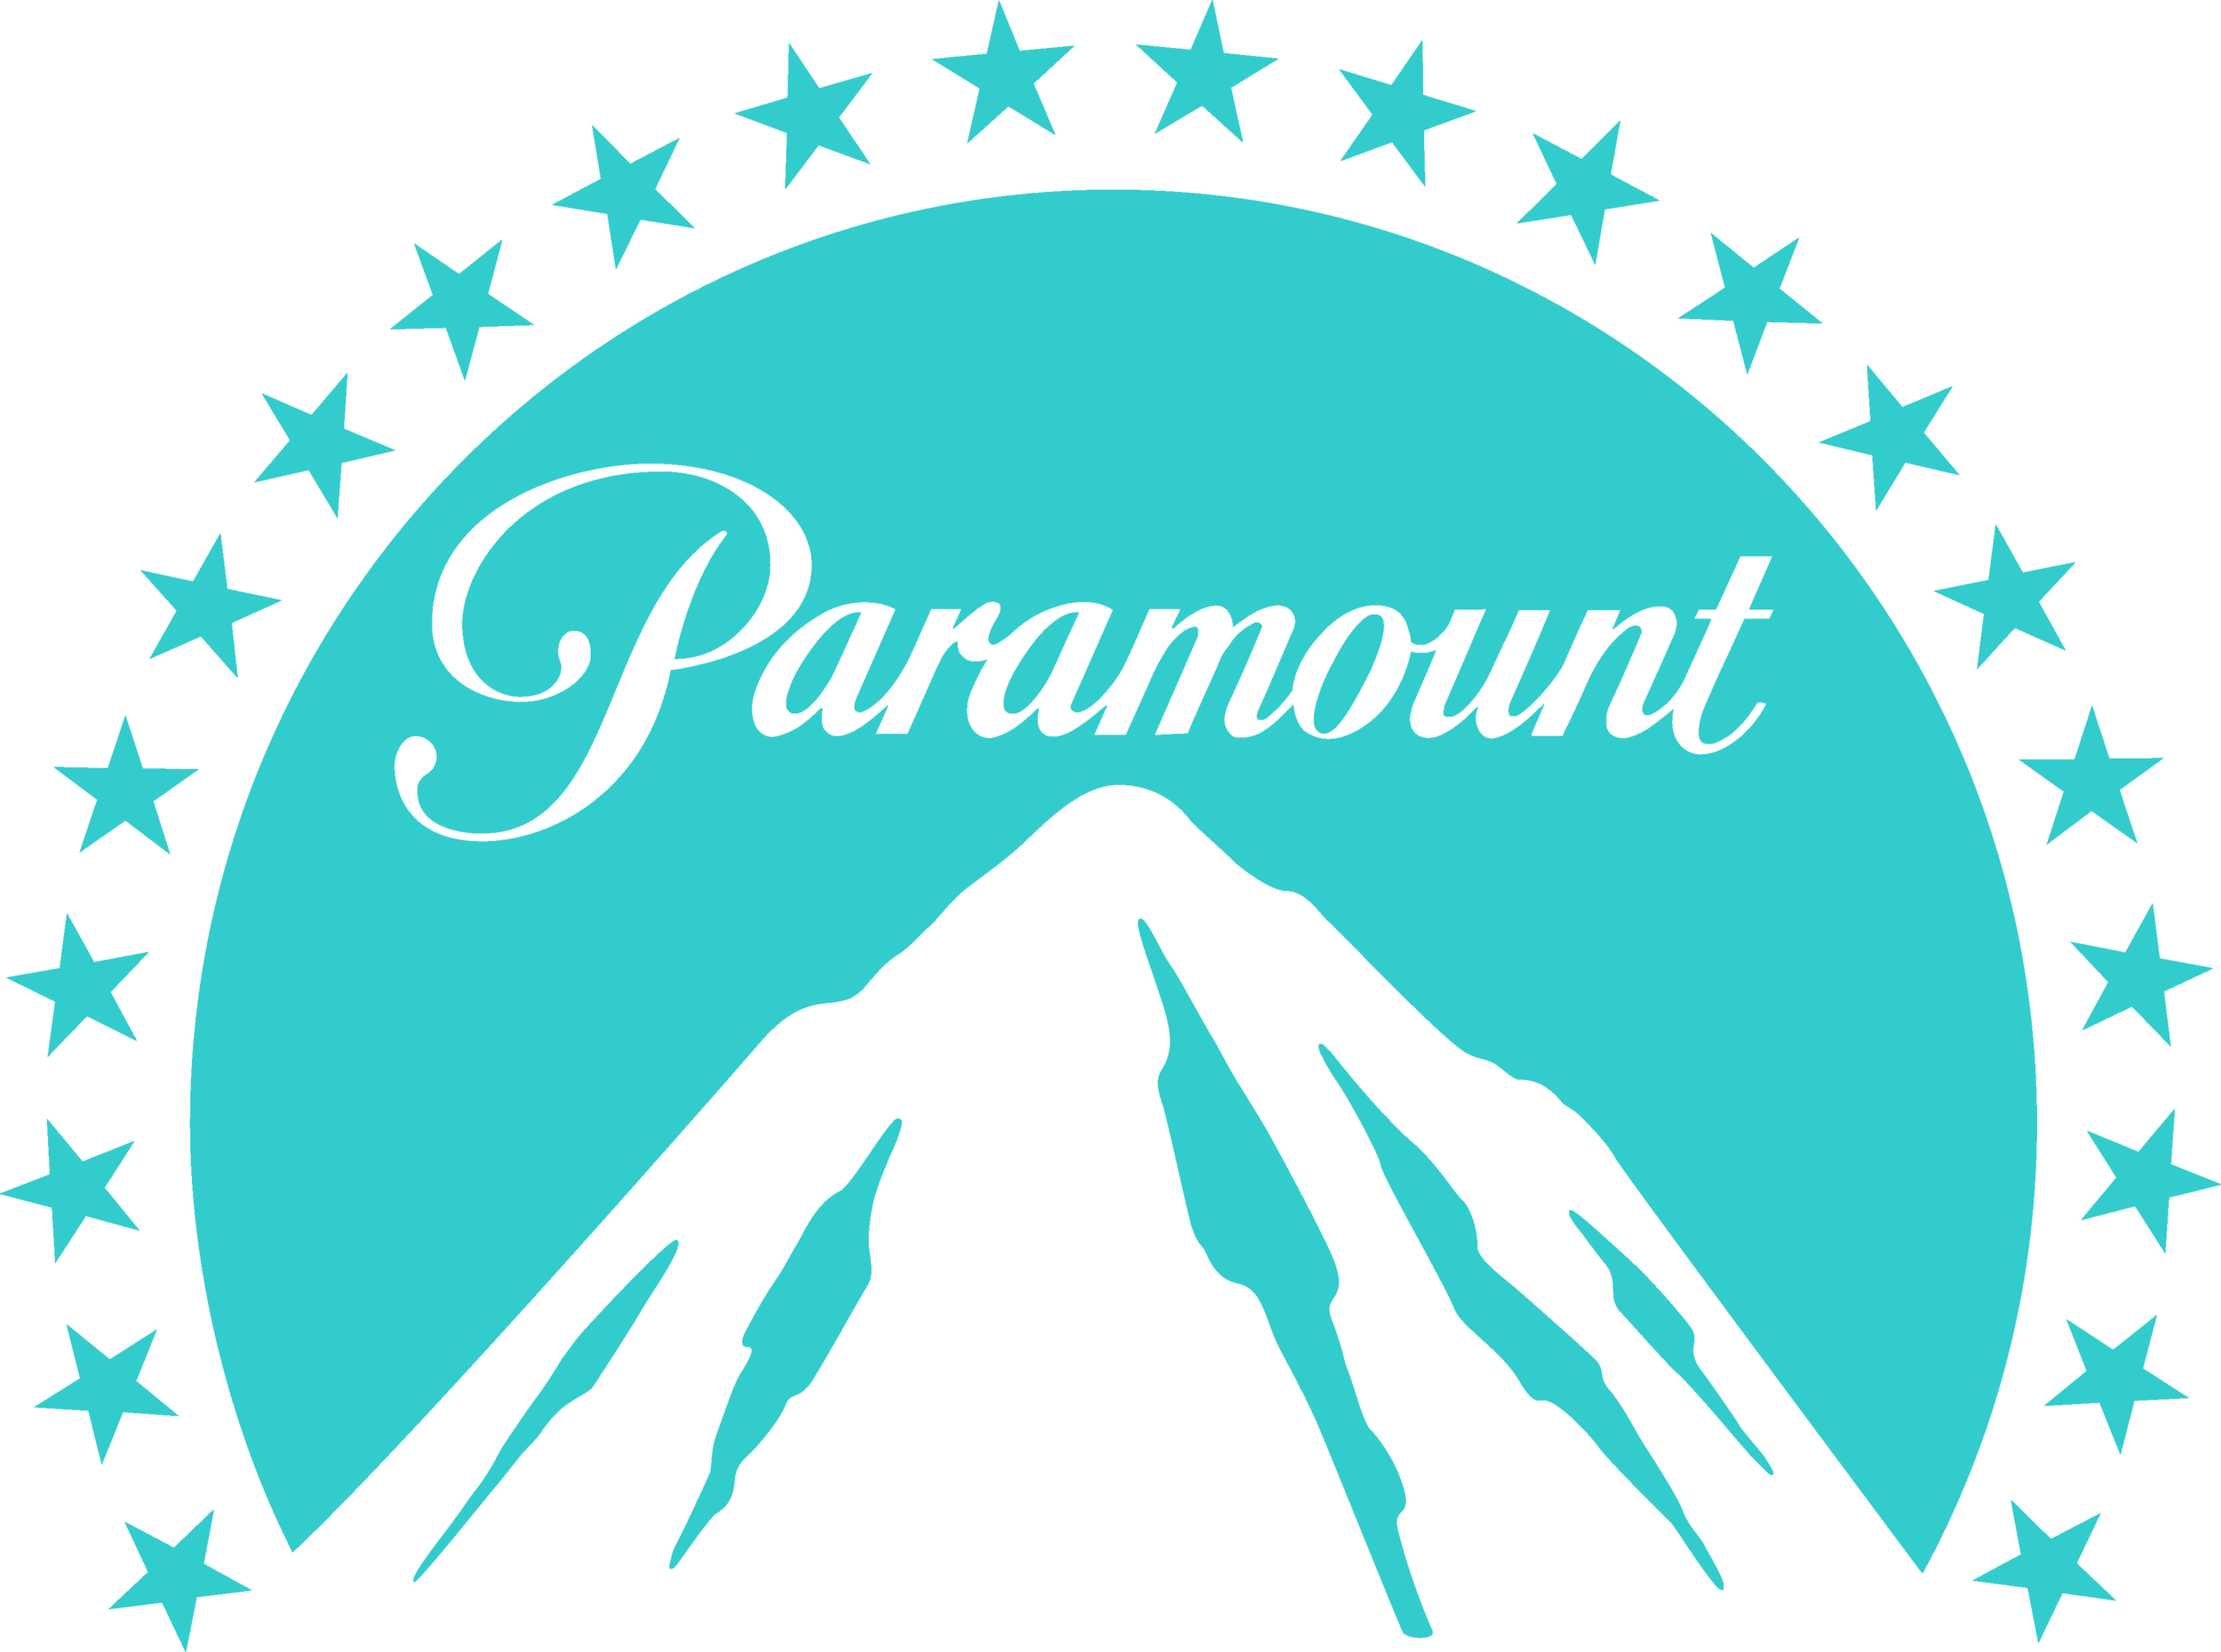 Paramount.2.png